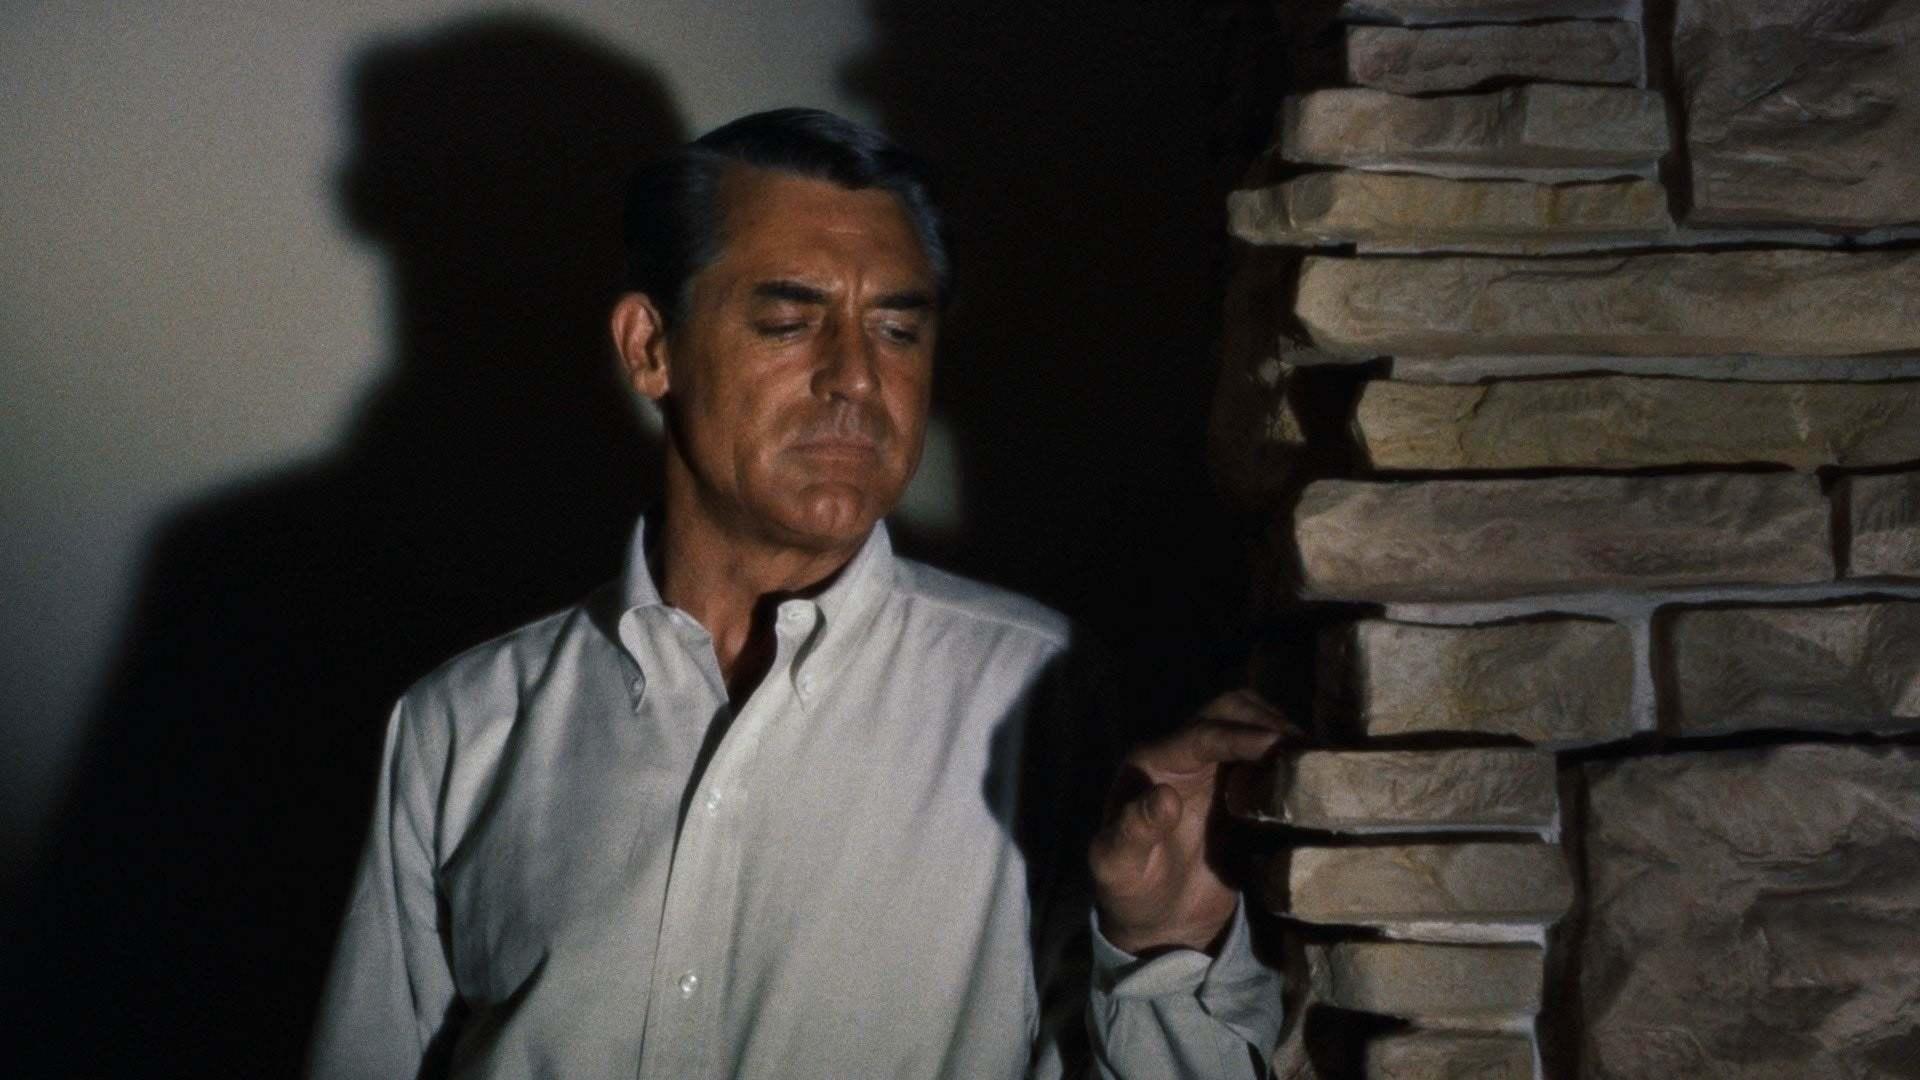 Кадры из фильма На север через северо-запад North by Northwest 1959